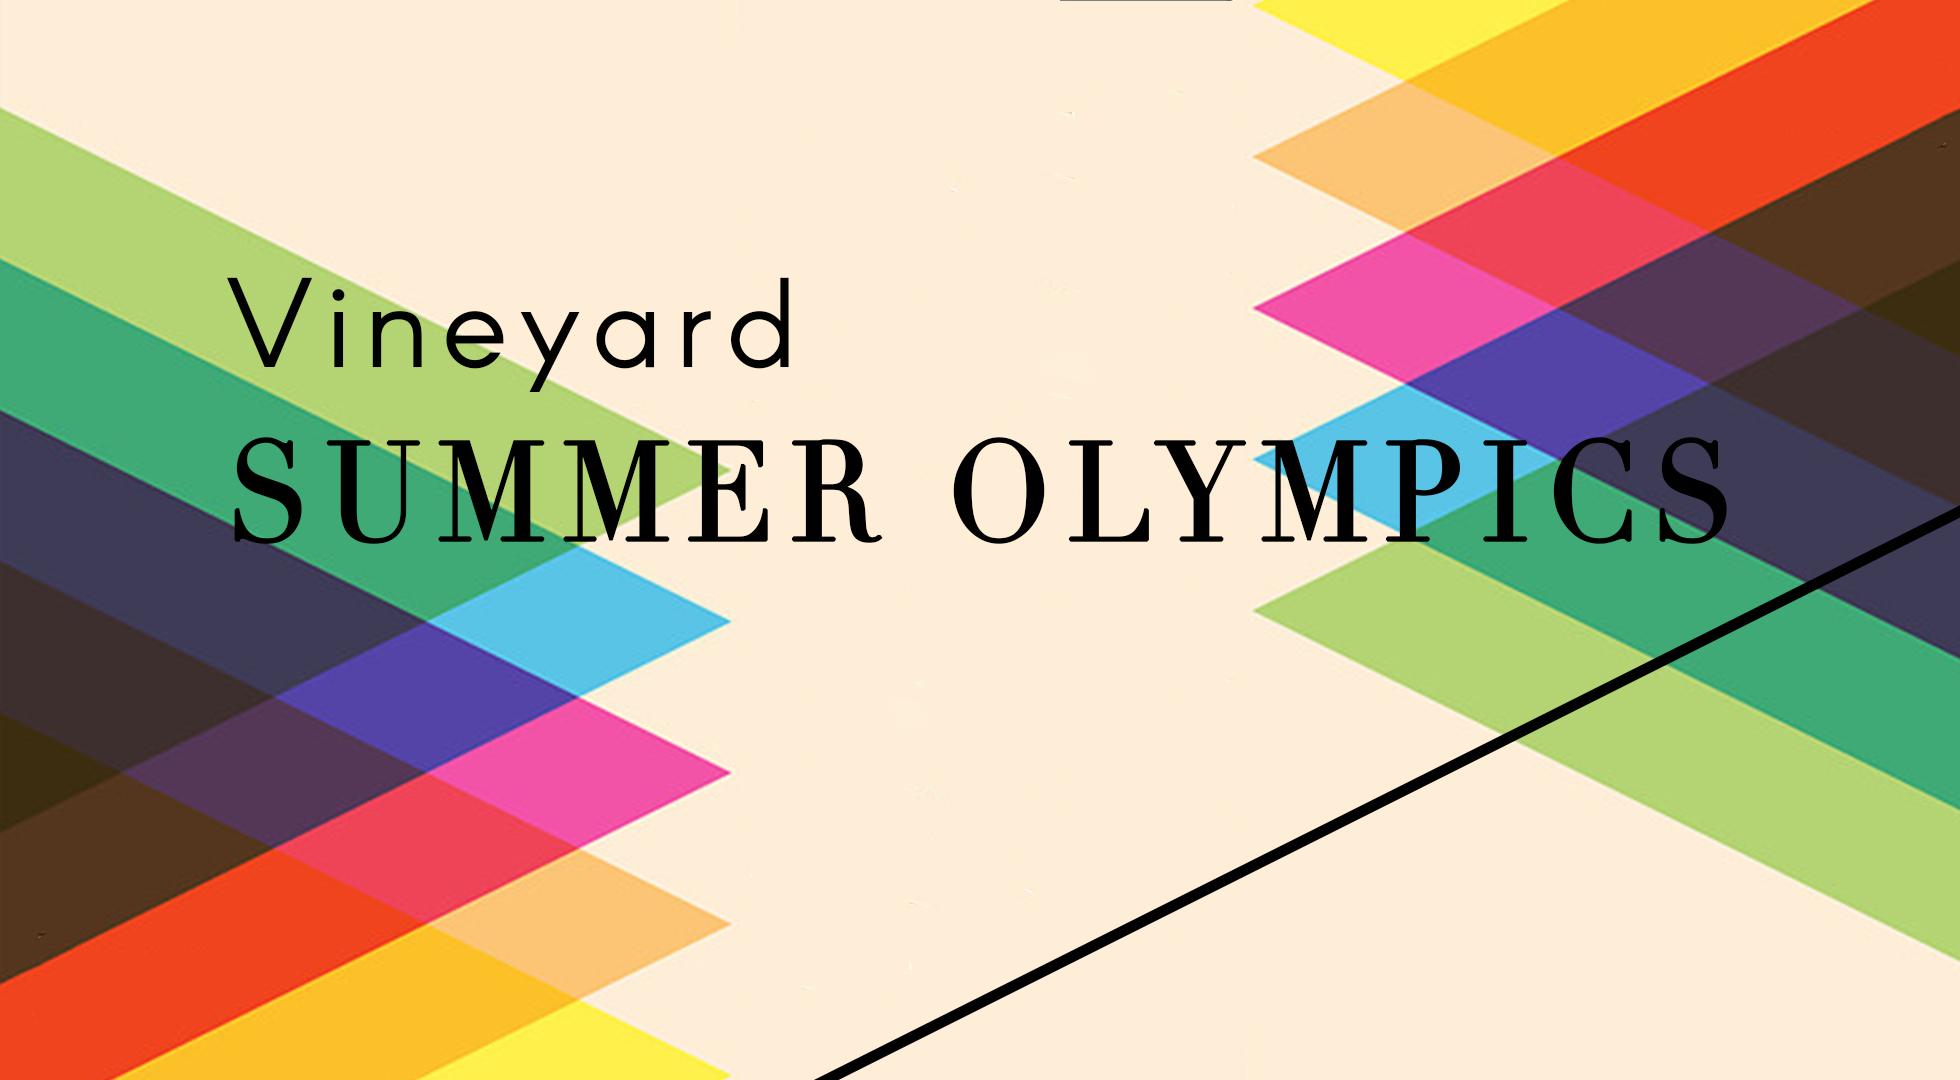 VineyardOlympicsWeb.jpg